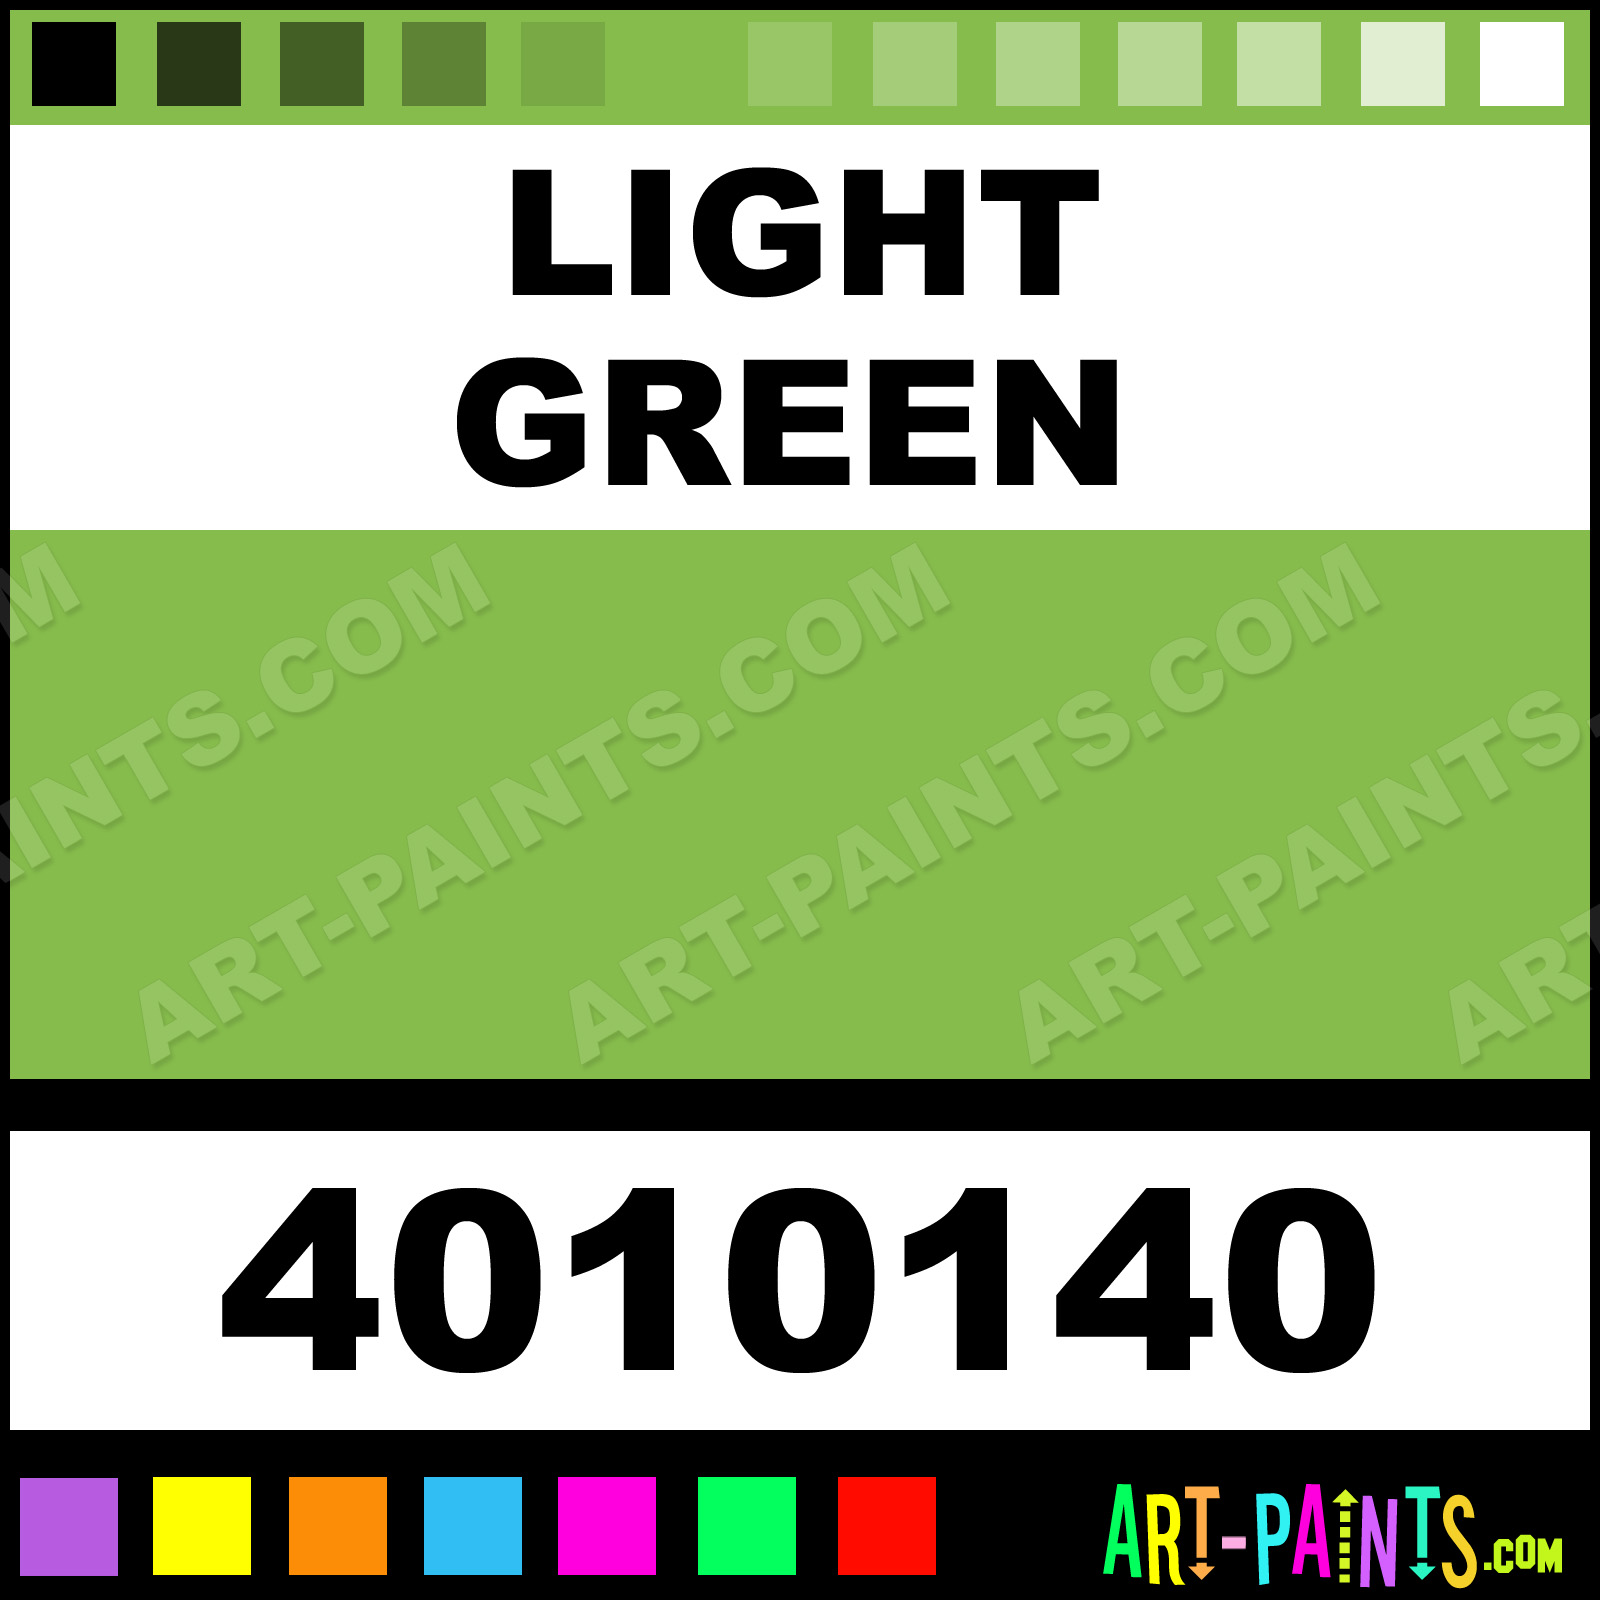 Light Green Bulletin Enamel Paints 4010140 Light Green Paint Light Green Color Chromatic Bulletin Paint 86bc4b Art Paints Com